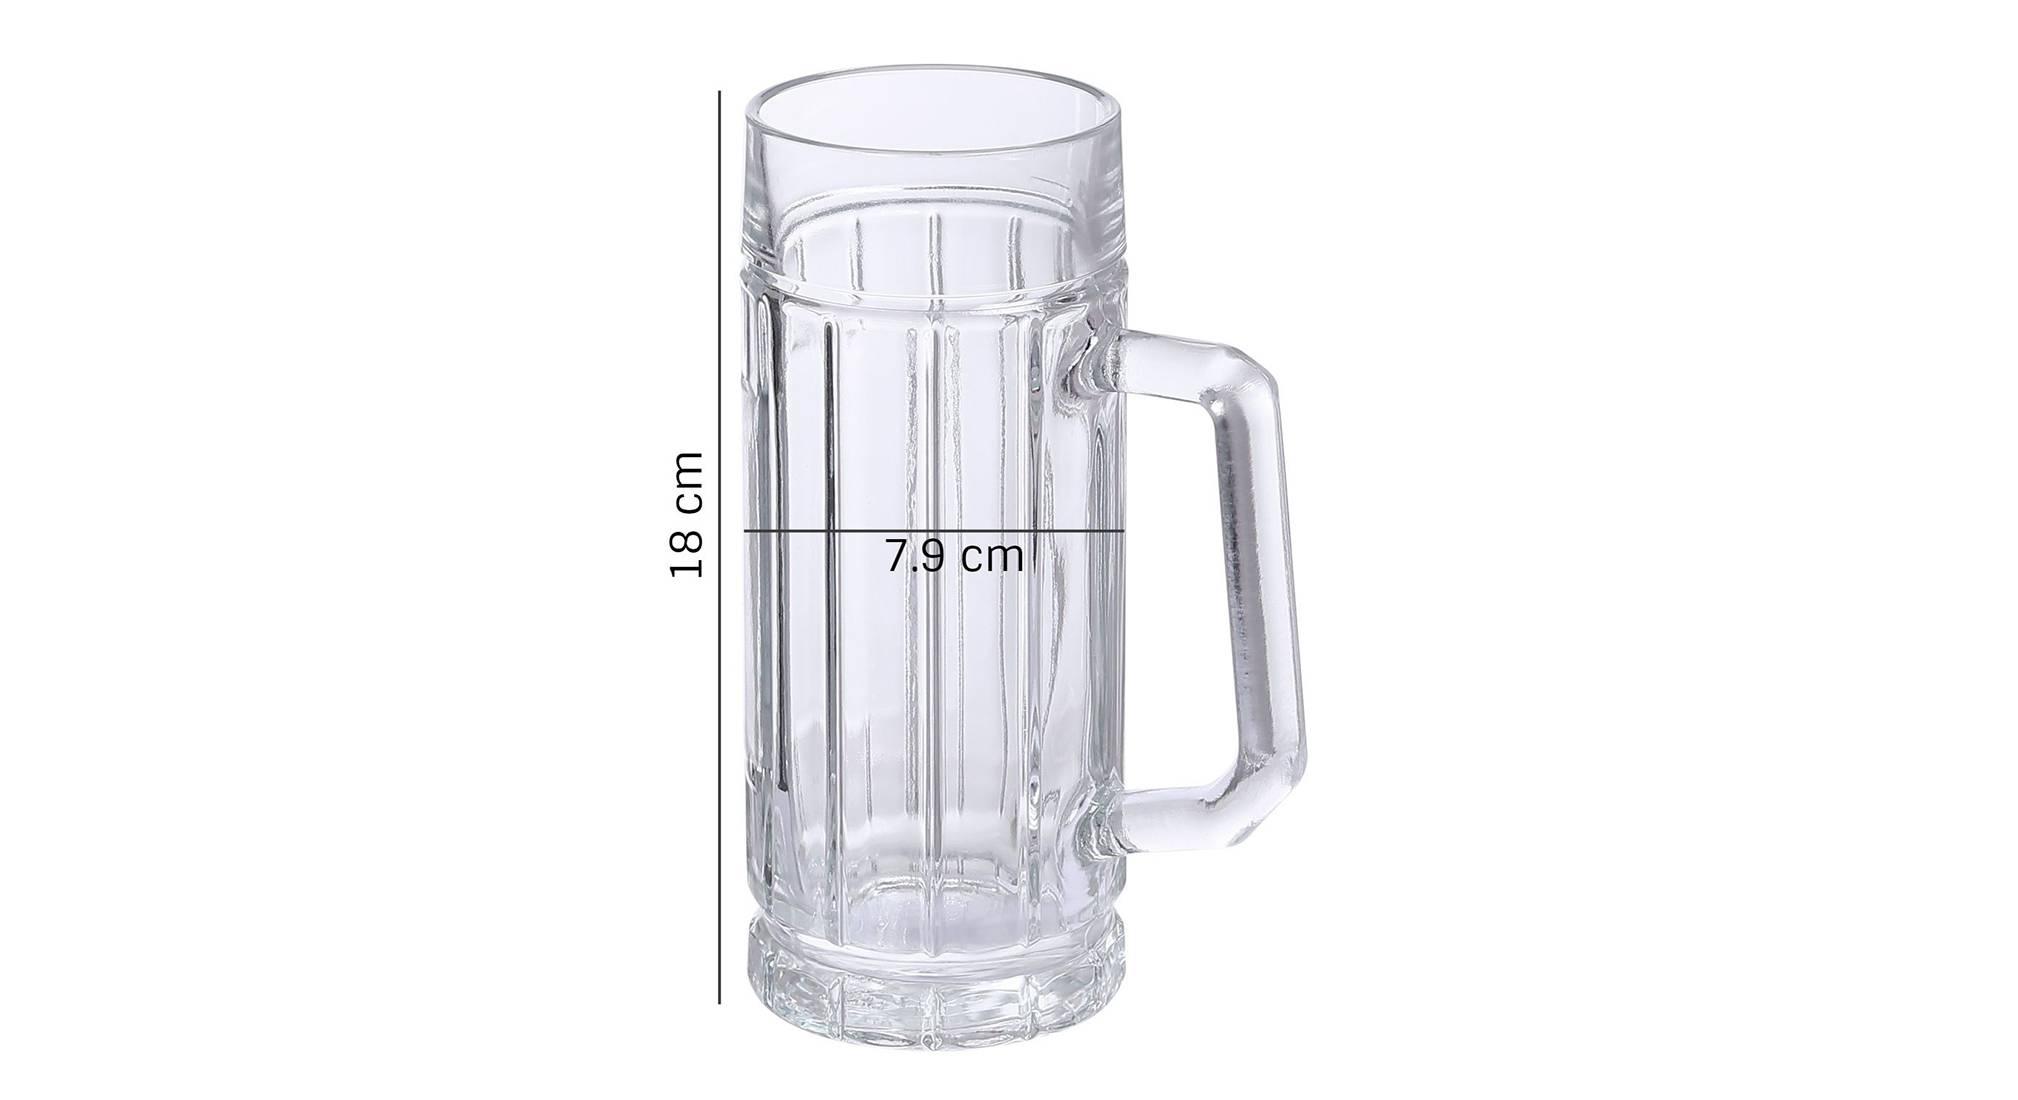 Torin beer glass set of 2 transparent 5